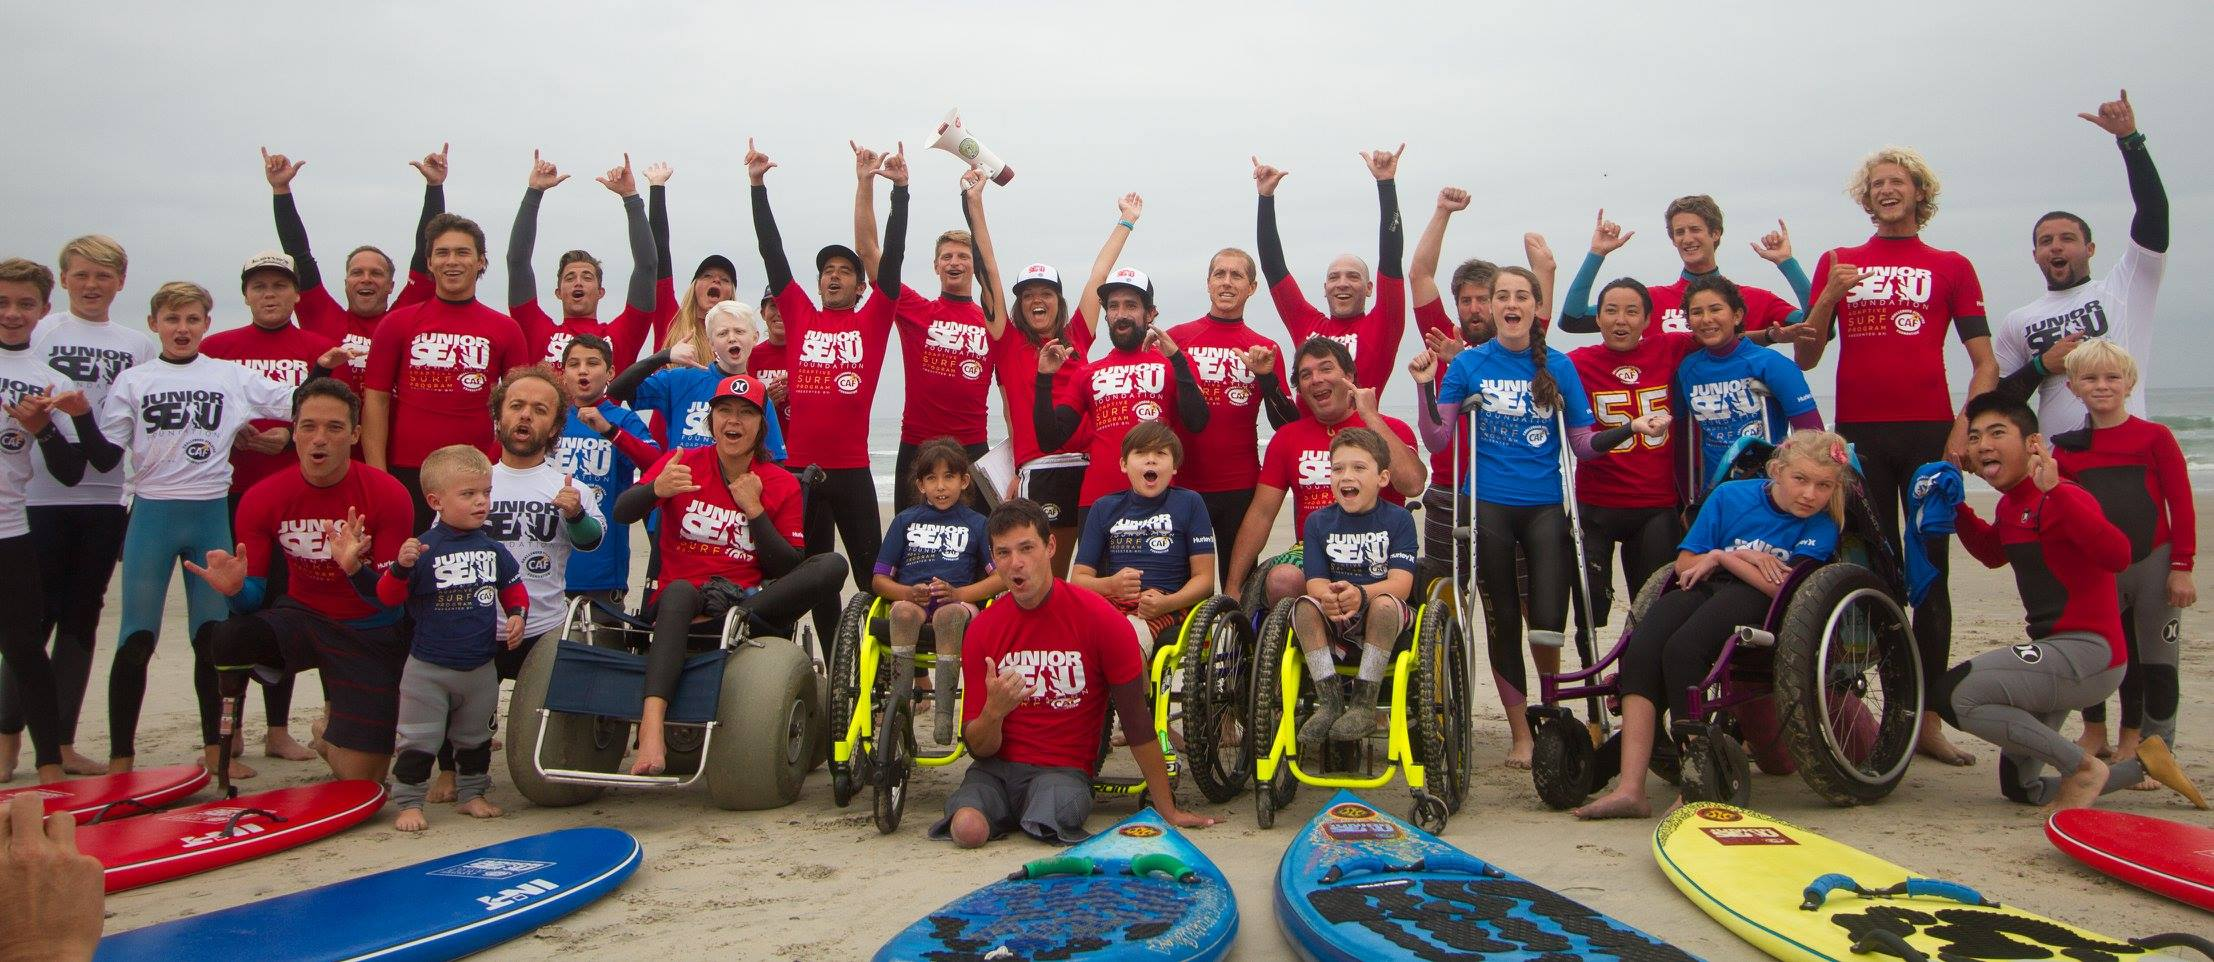 2016 Junior Seau Foundation Adaptive Youth Surf Camp presented by CAF